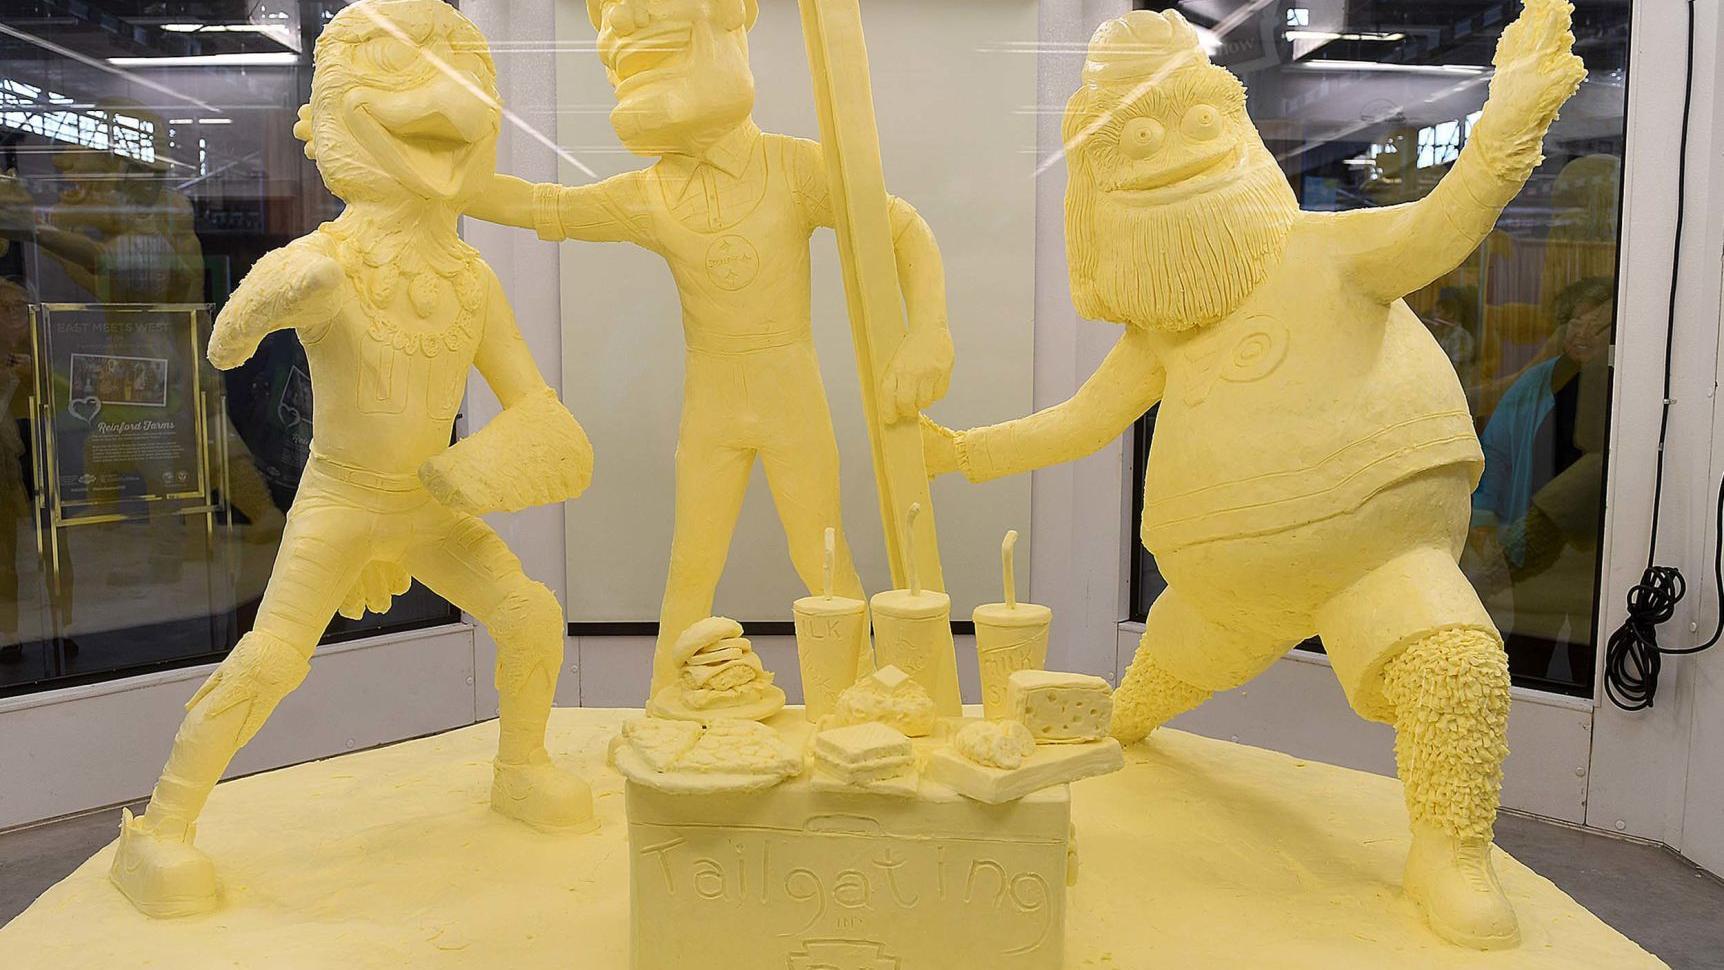 New Farm Show butter sculpture features Gritty, pro-sports mascots | The  Sentinel: News | cumberlink.com